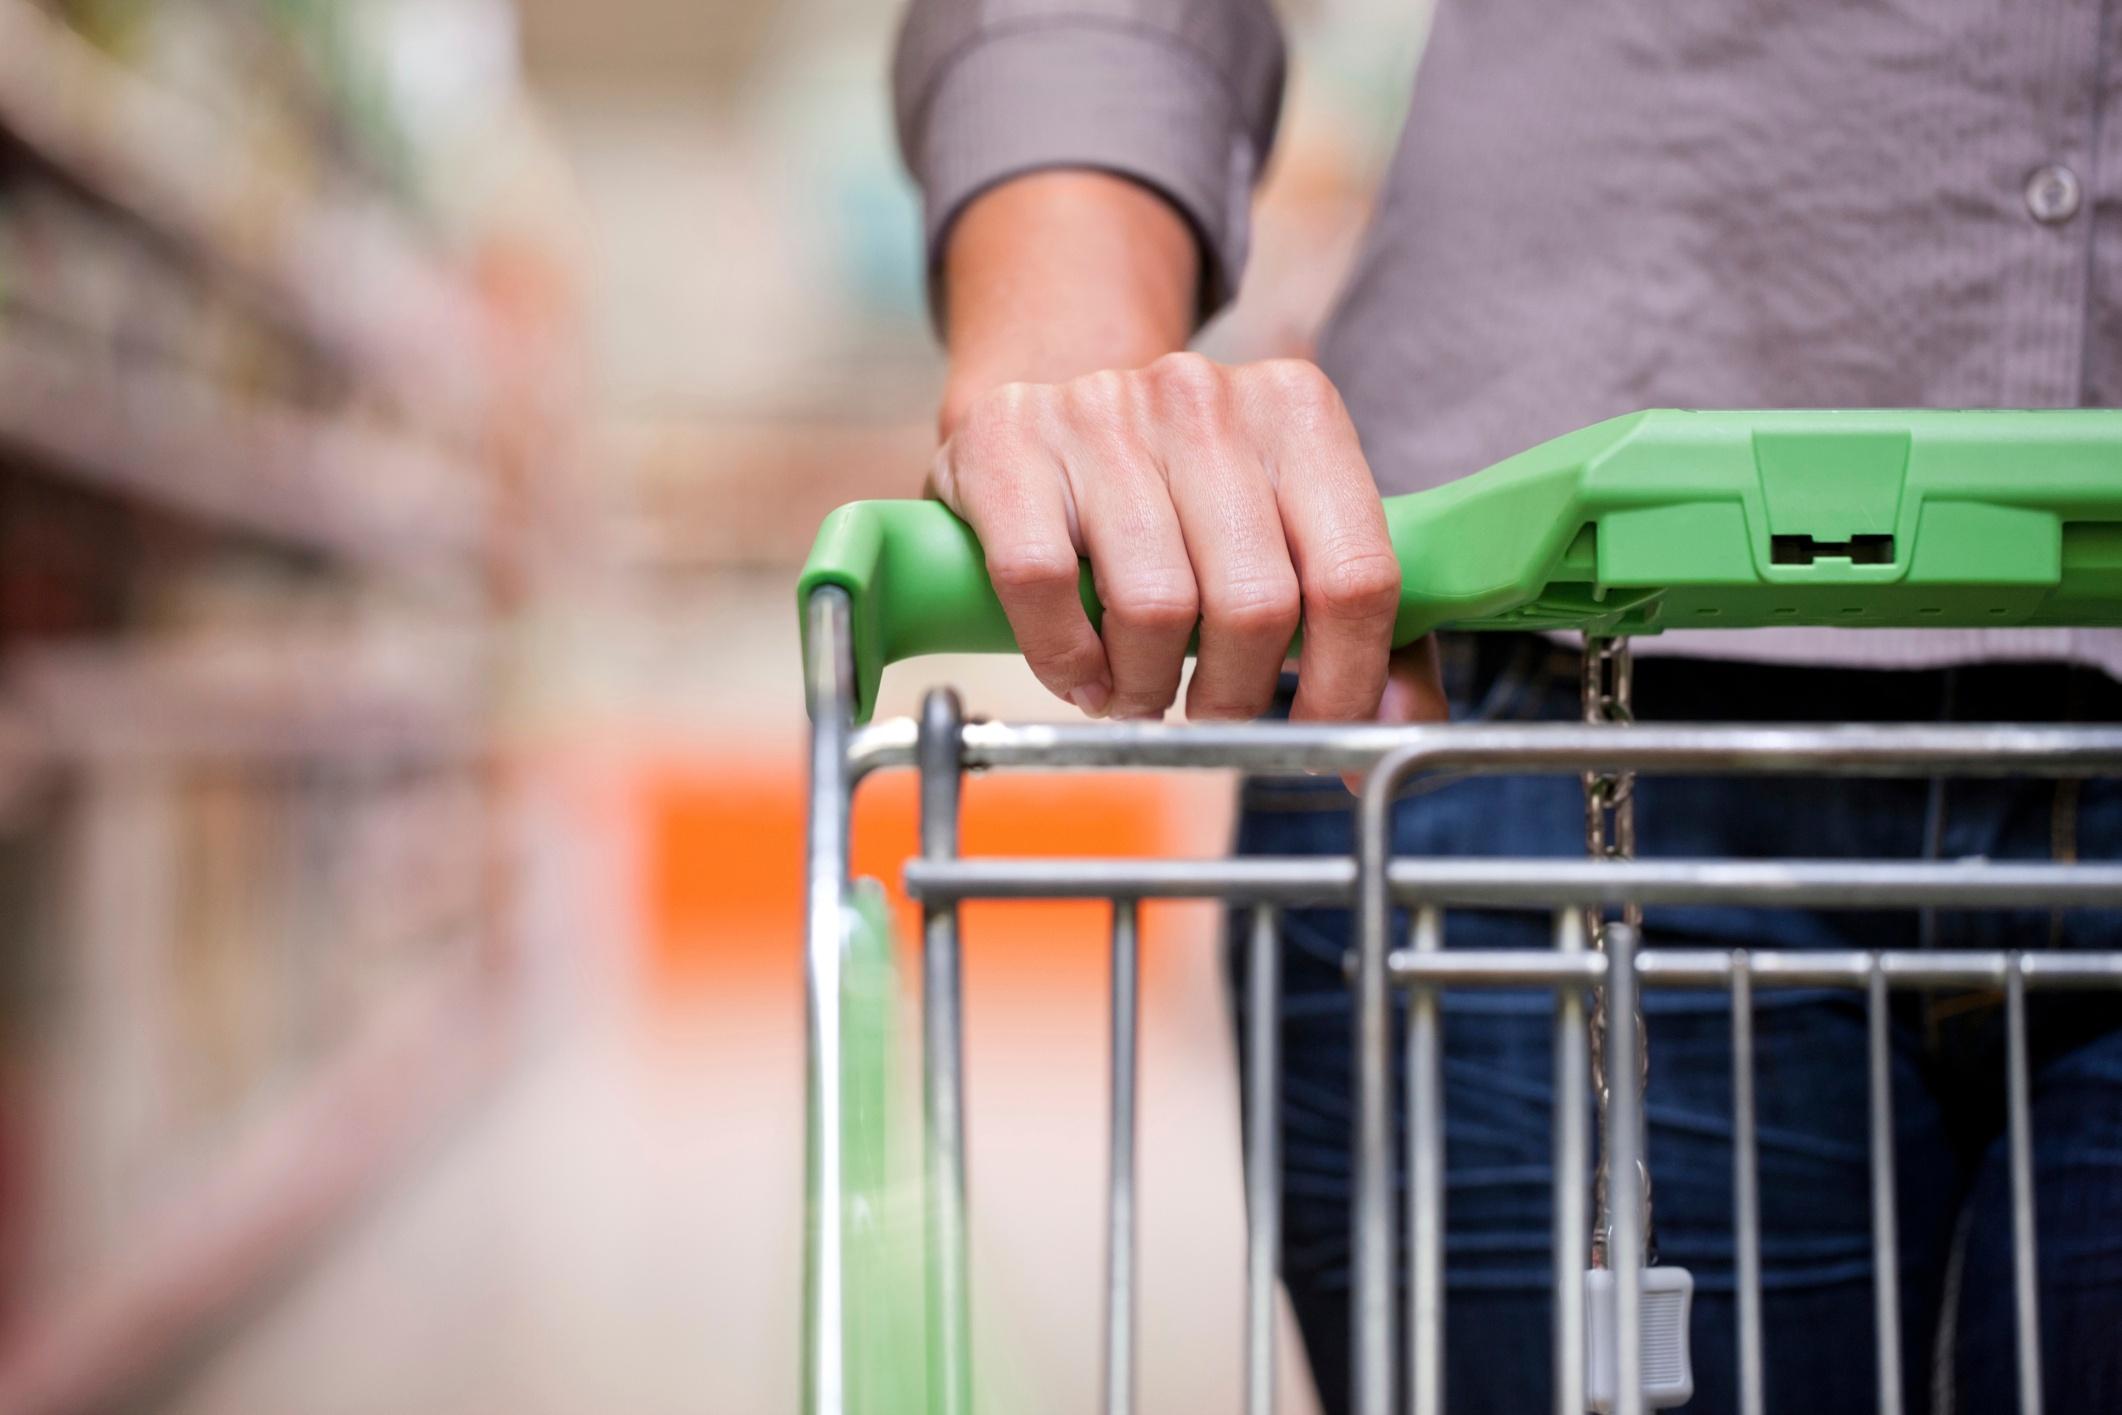 pushcart_in_grocery_store.jpg